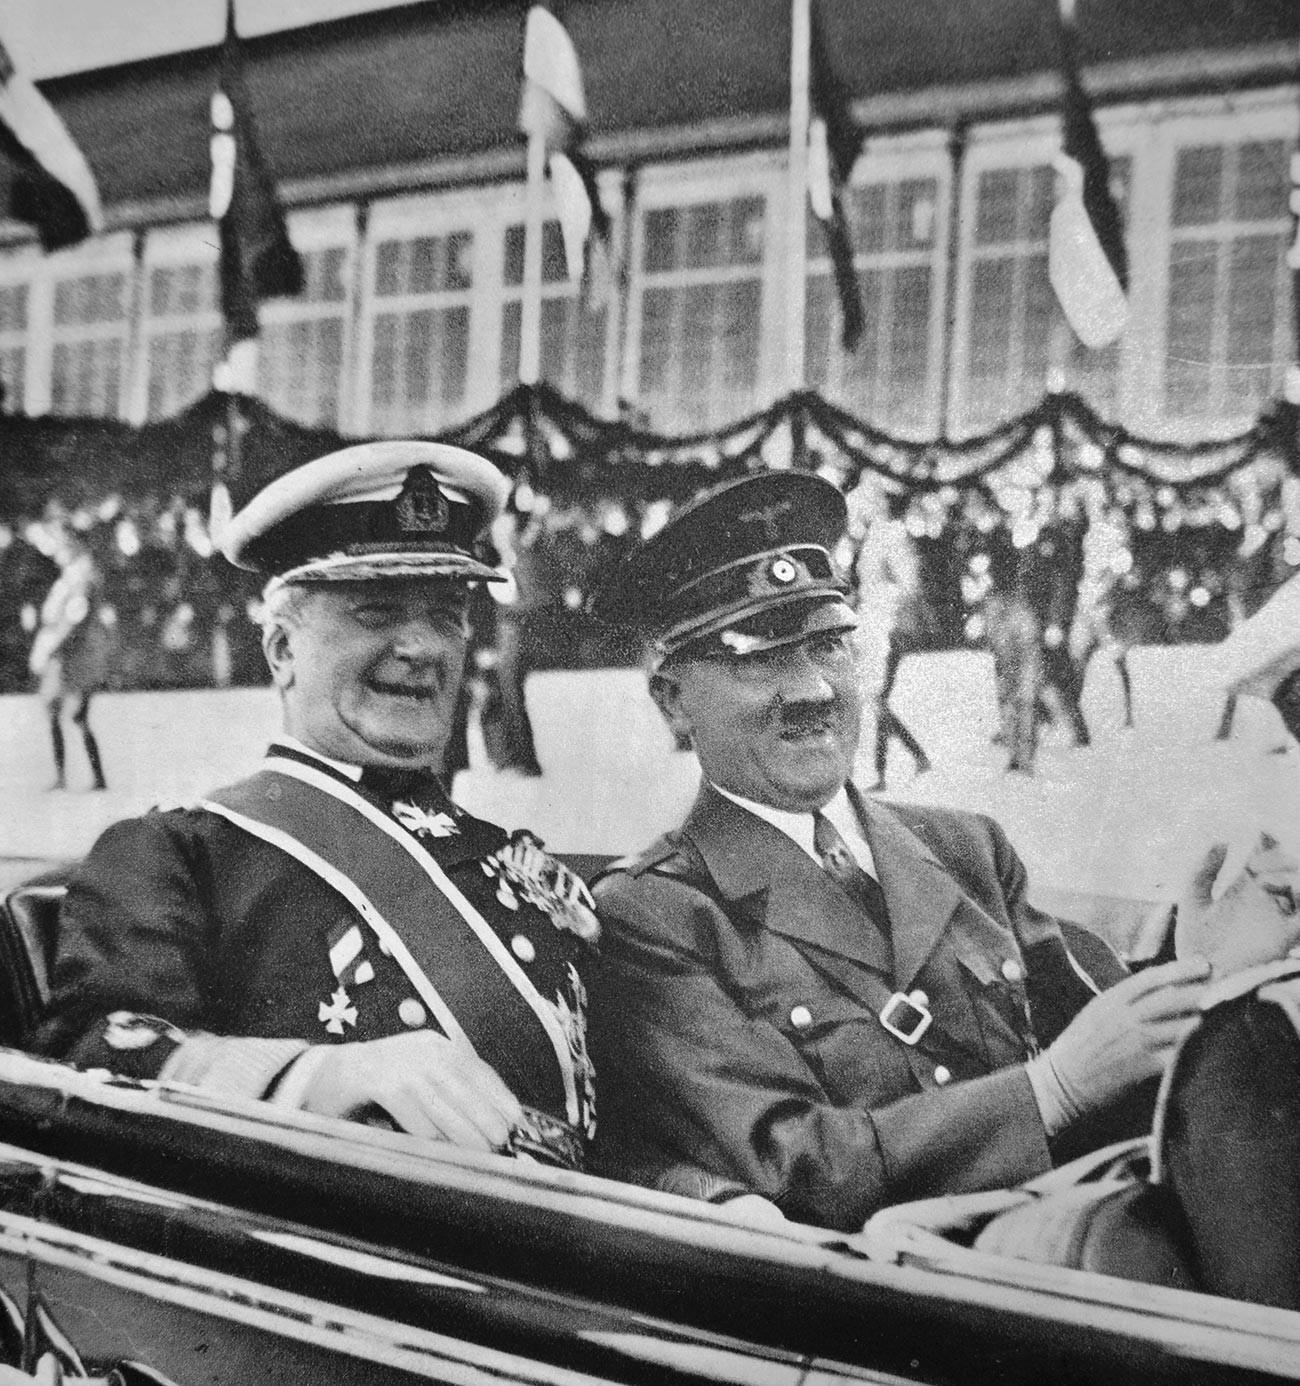 Унгарскиот лидер Миклош Хорти и Адолф Хитлер 1938 година.